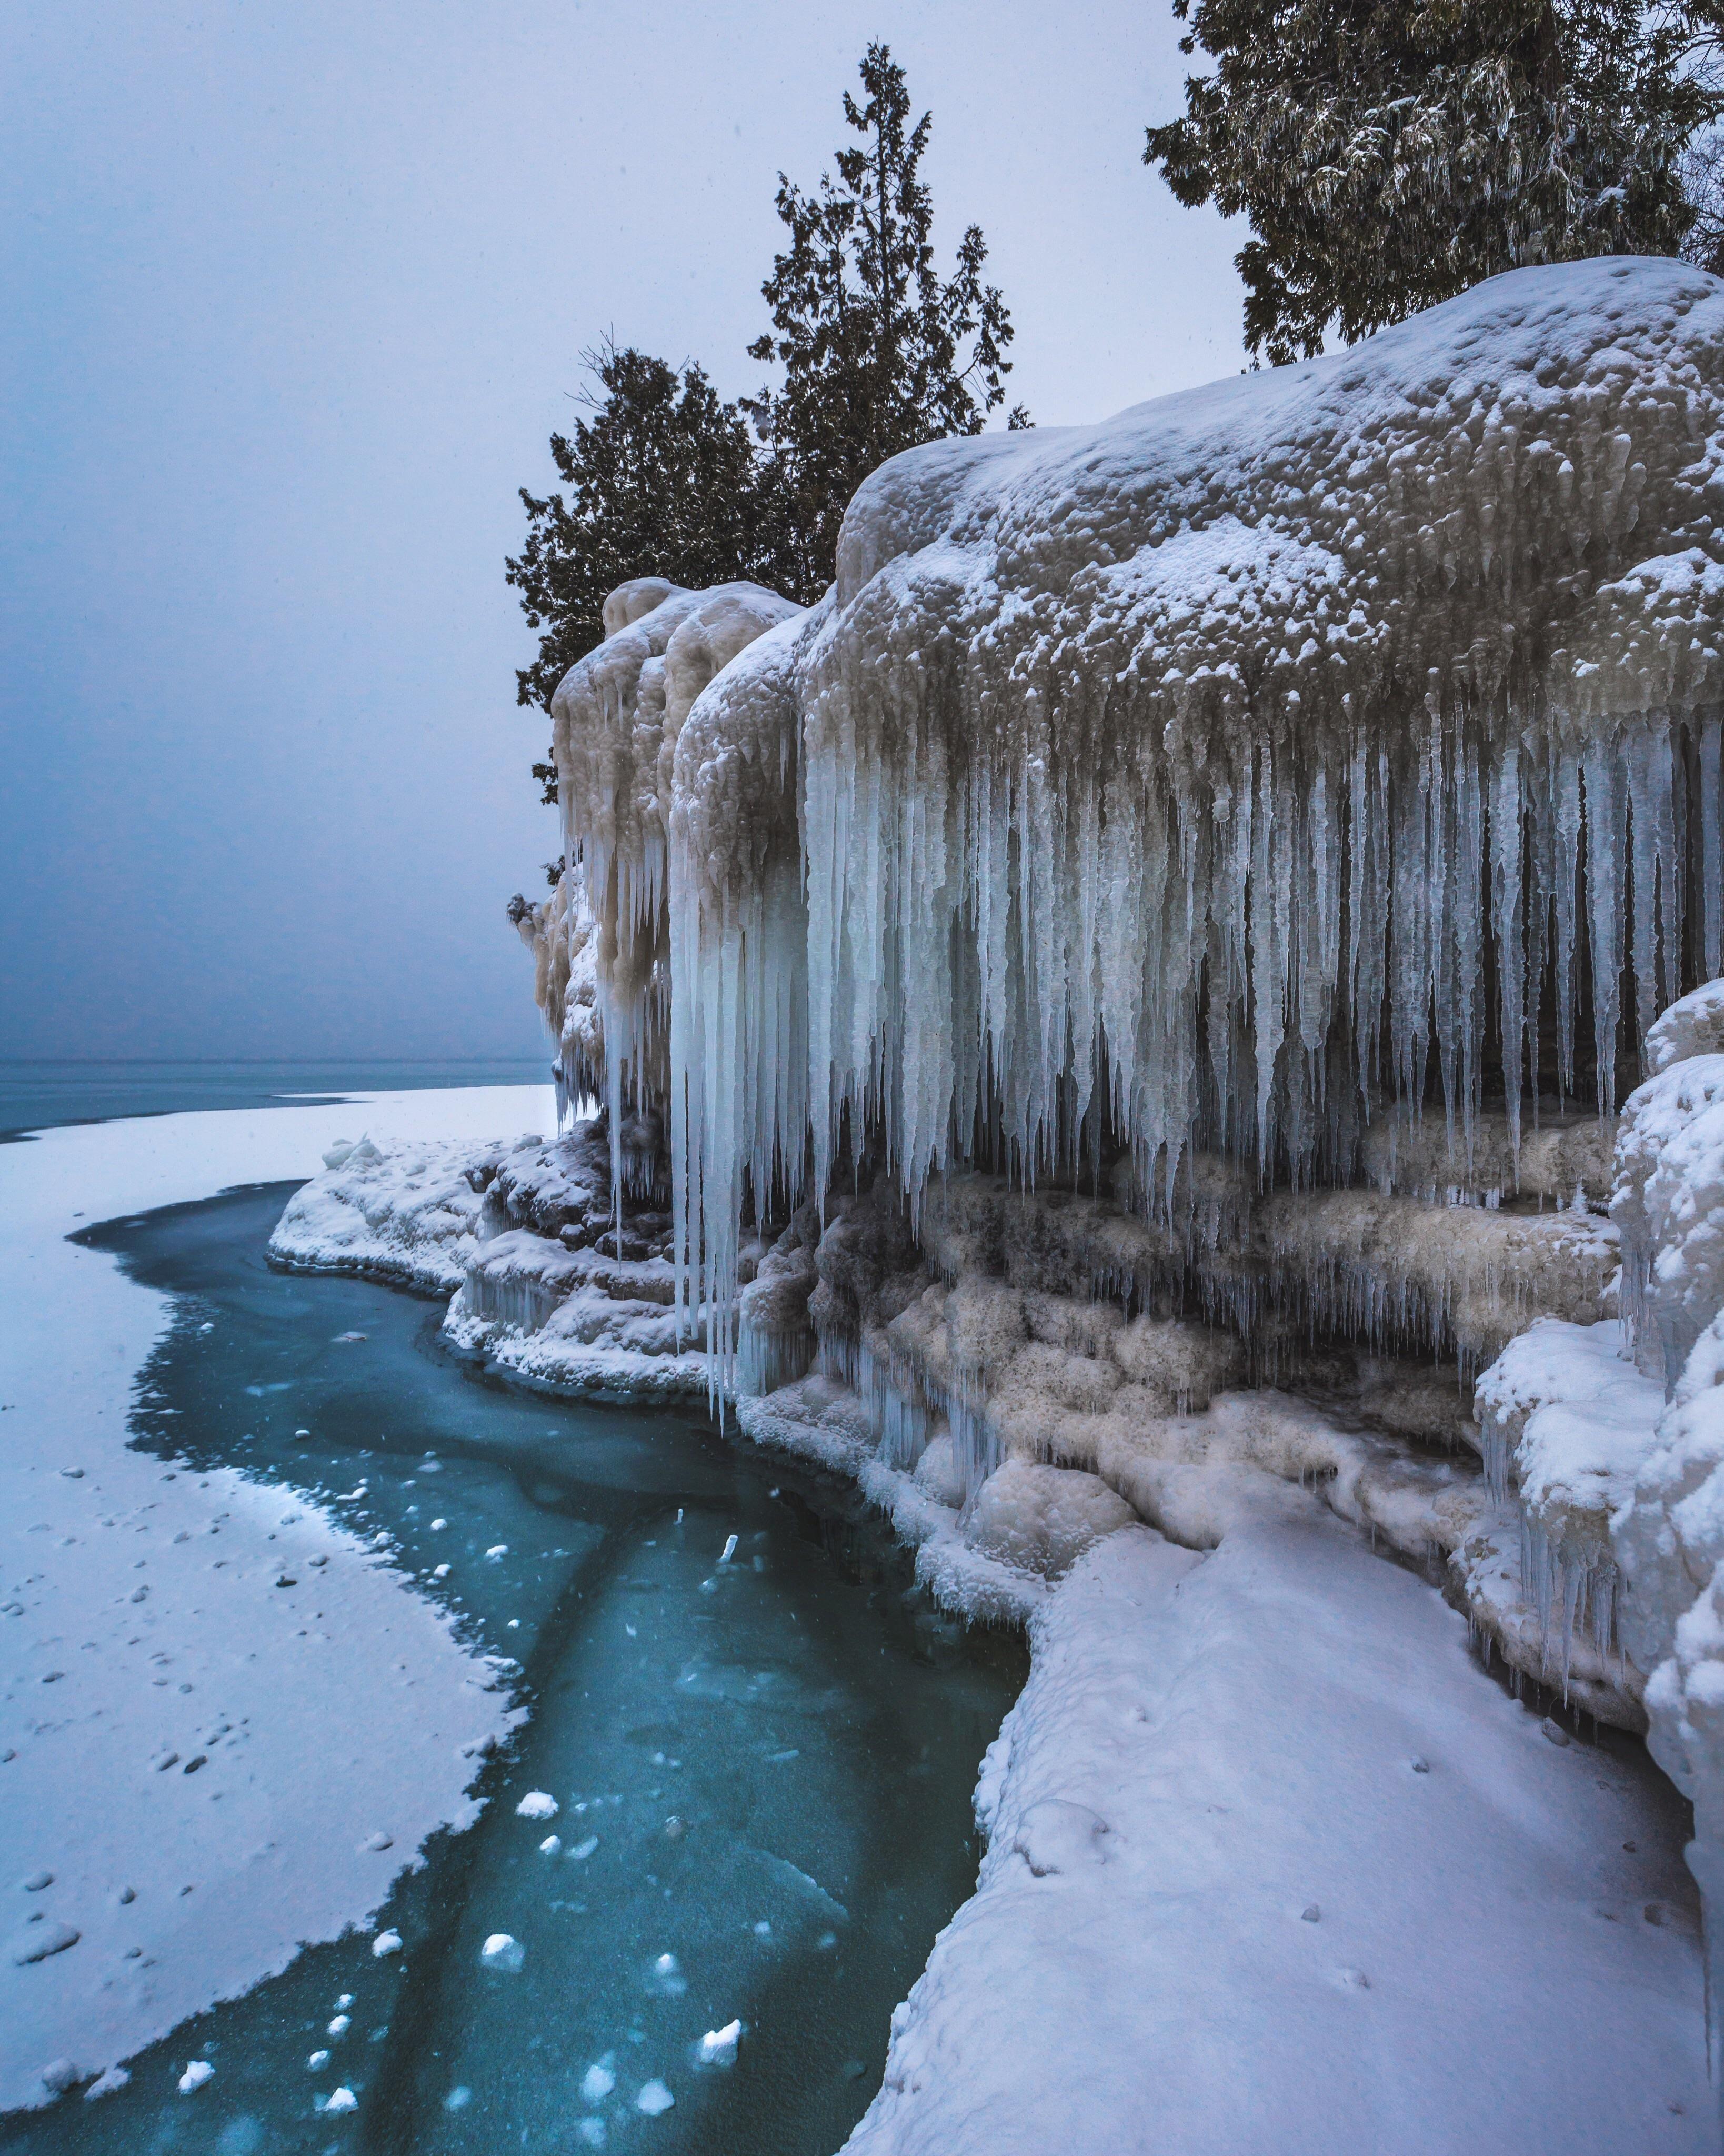 25 Ft Frozen Cliffs Off Of Lake Michigan Door County Wi Oc 3276x4096 Ig Grantplace Door County Winter Nature Photography Snow Pictures